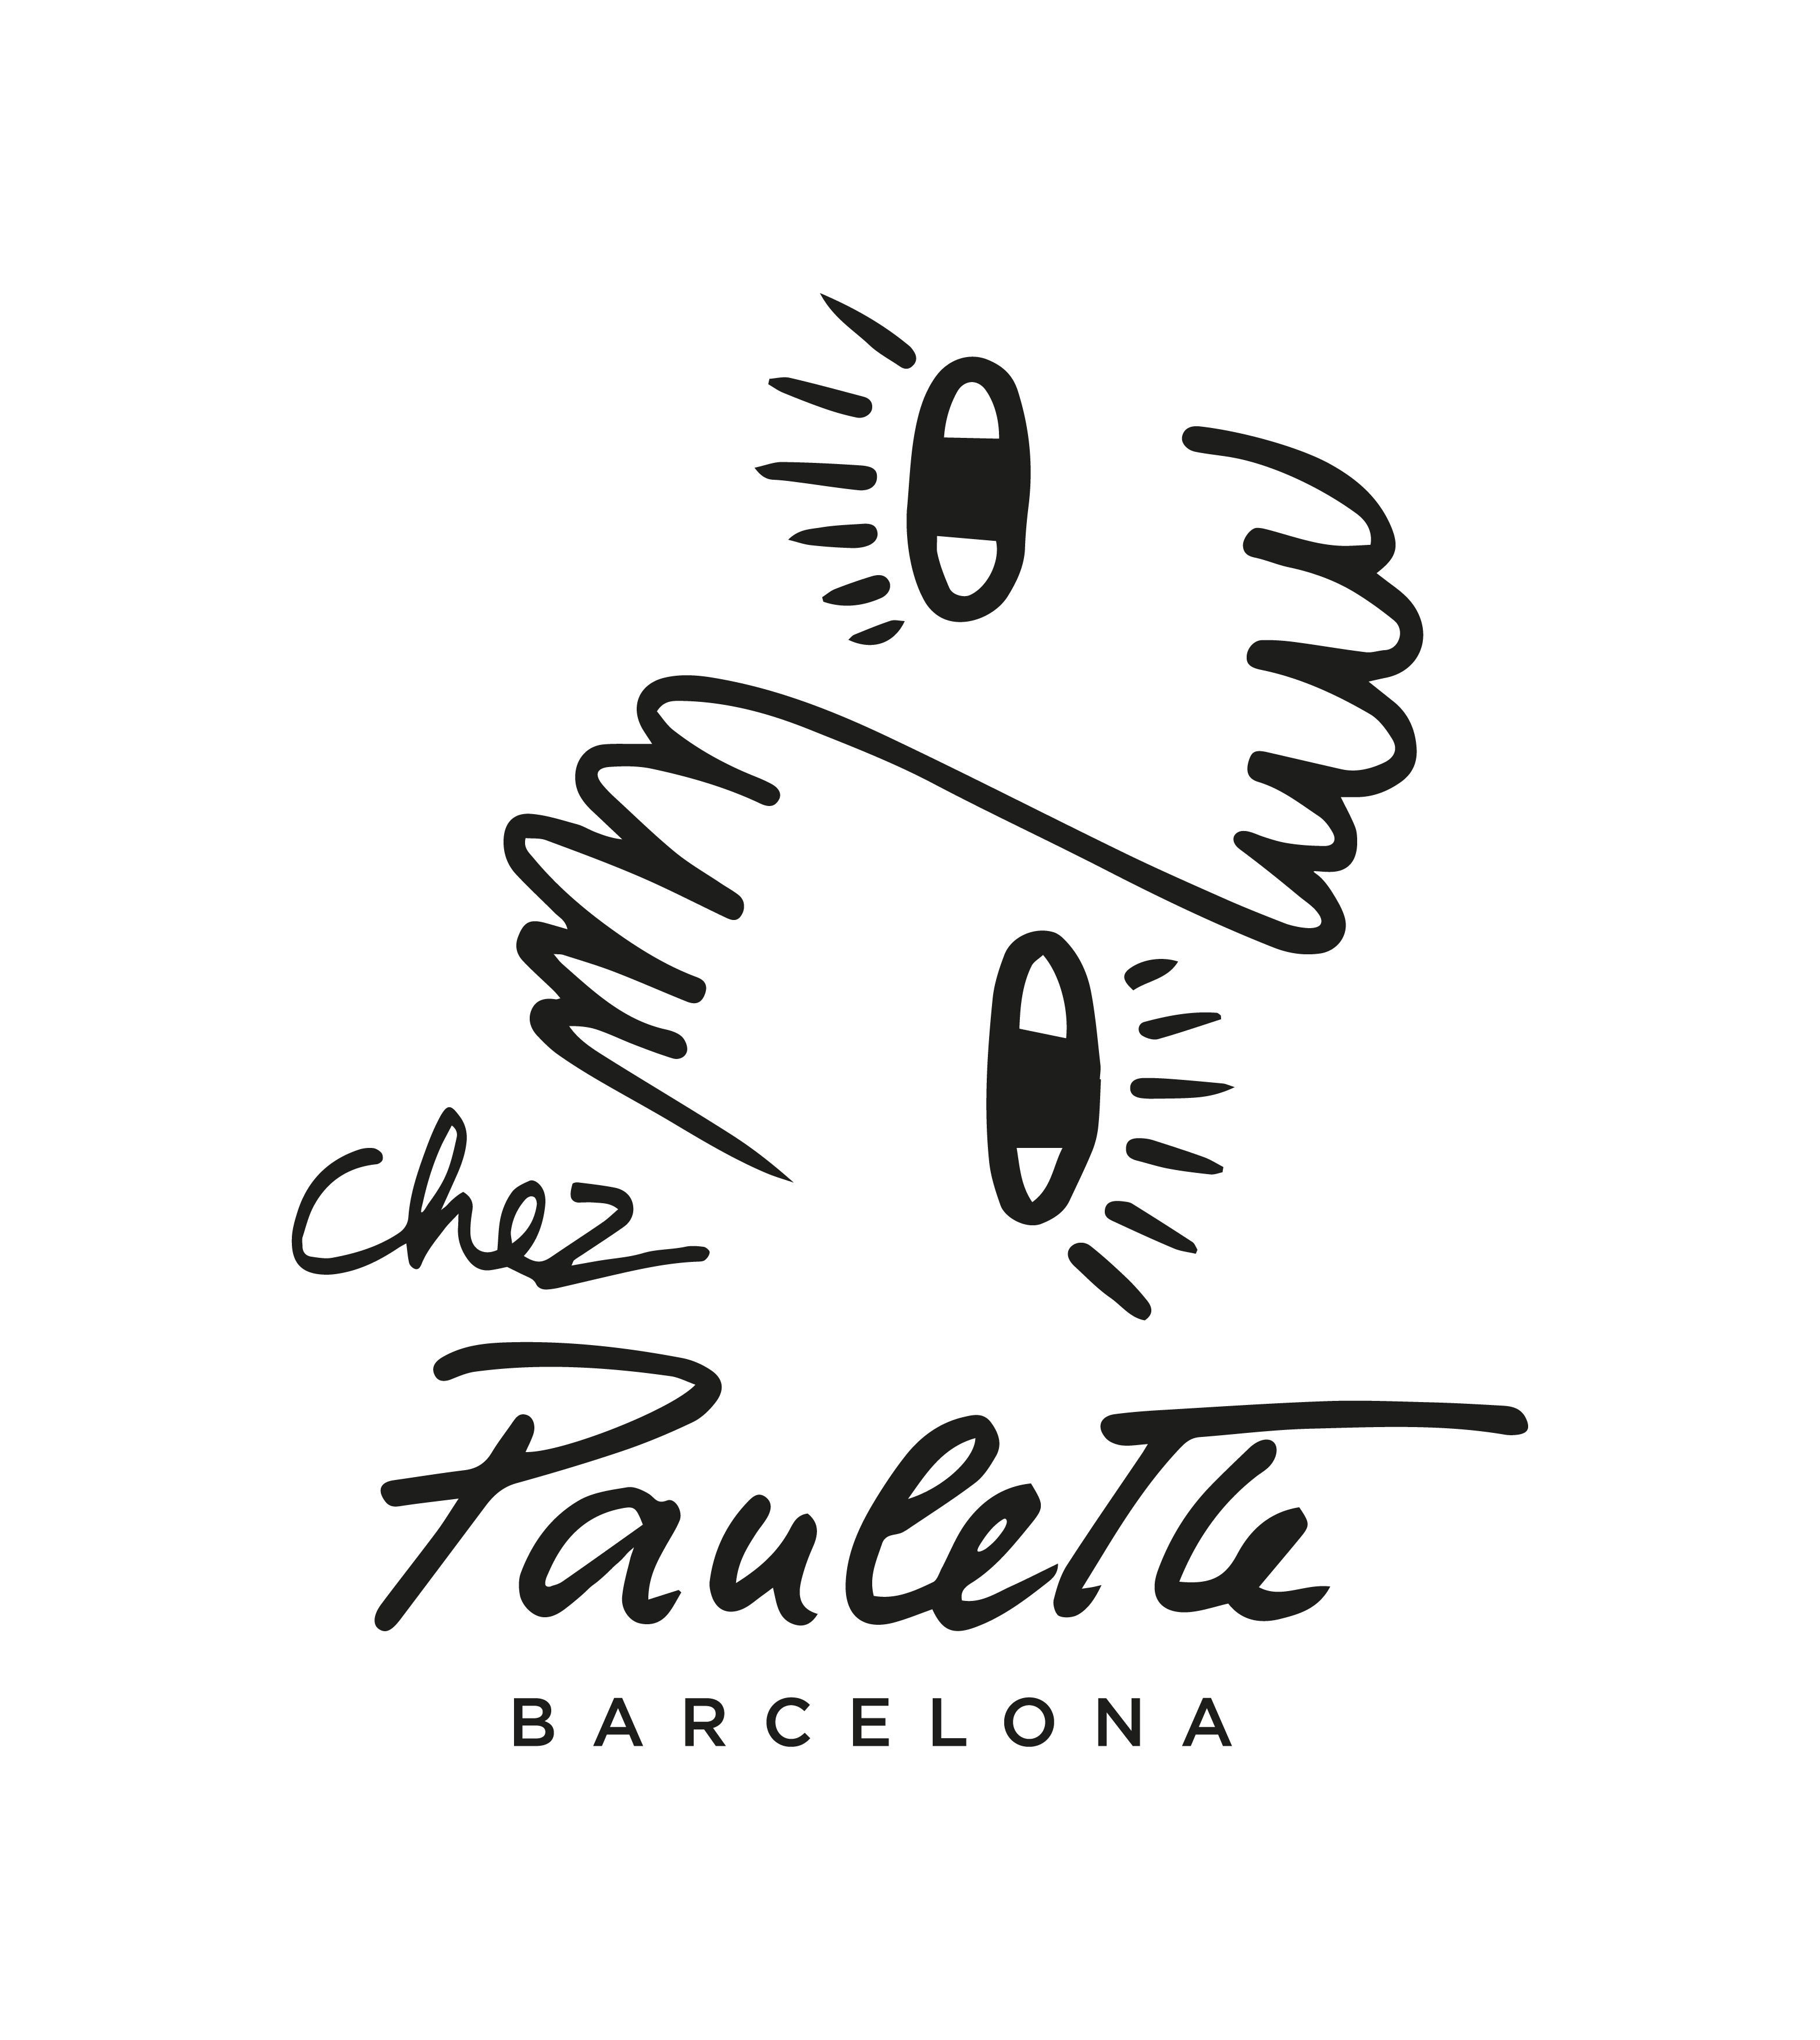 Chez Paulette Barcelona